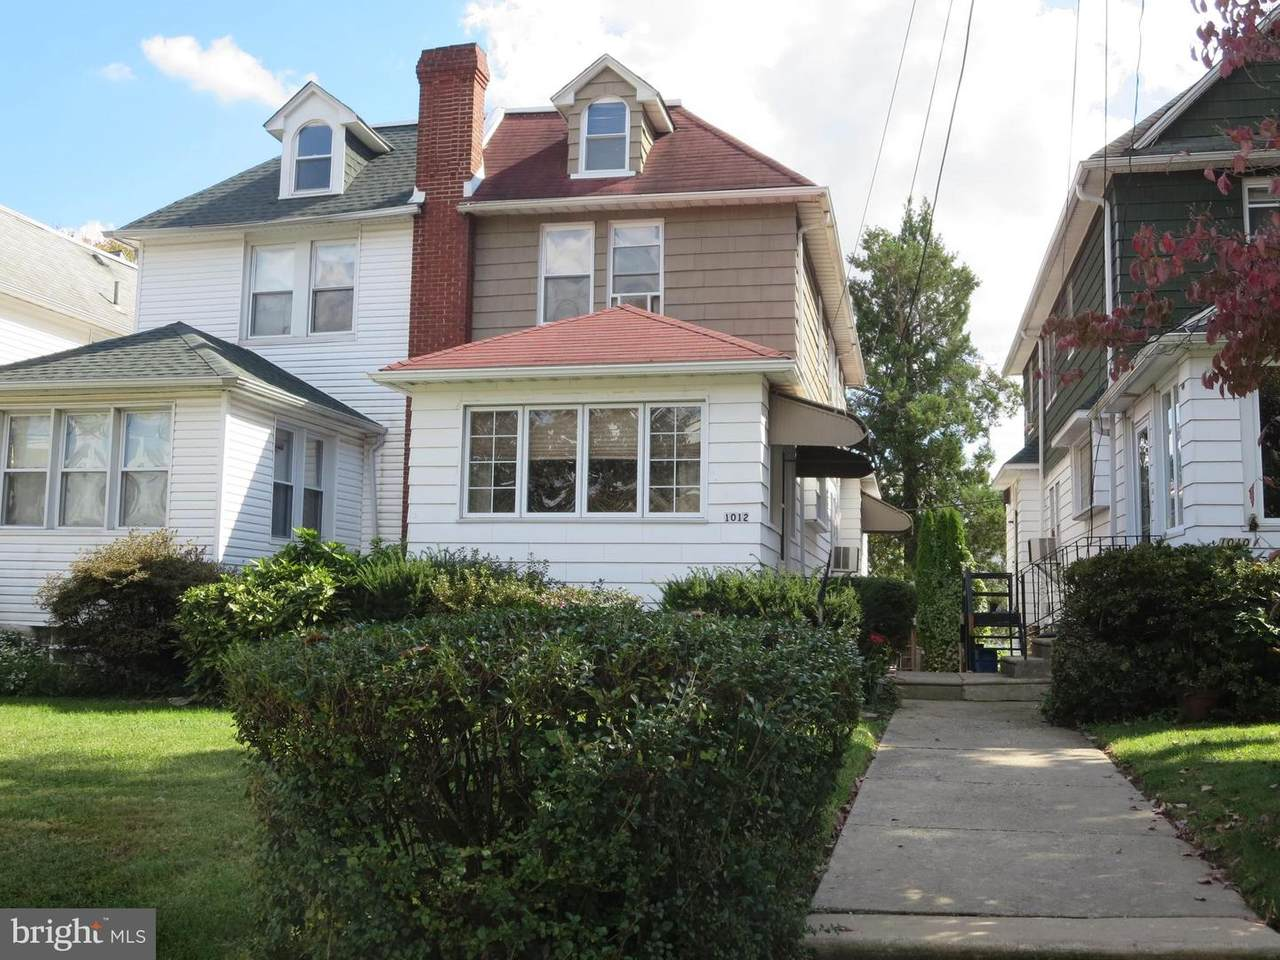 1012 Whitby Avenue - Photo 1